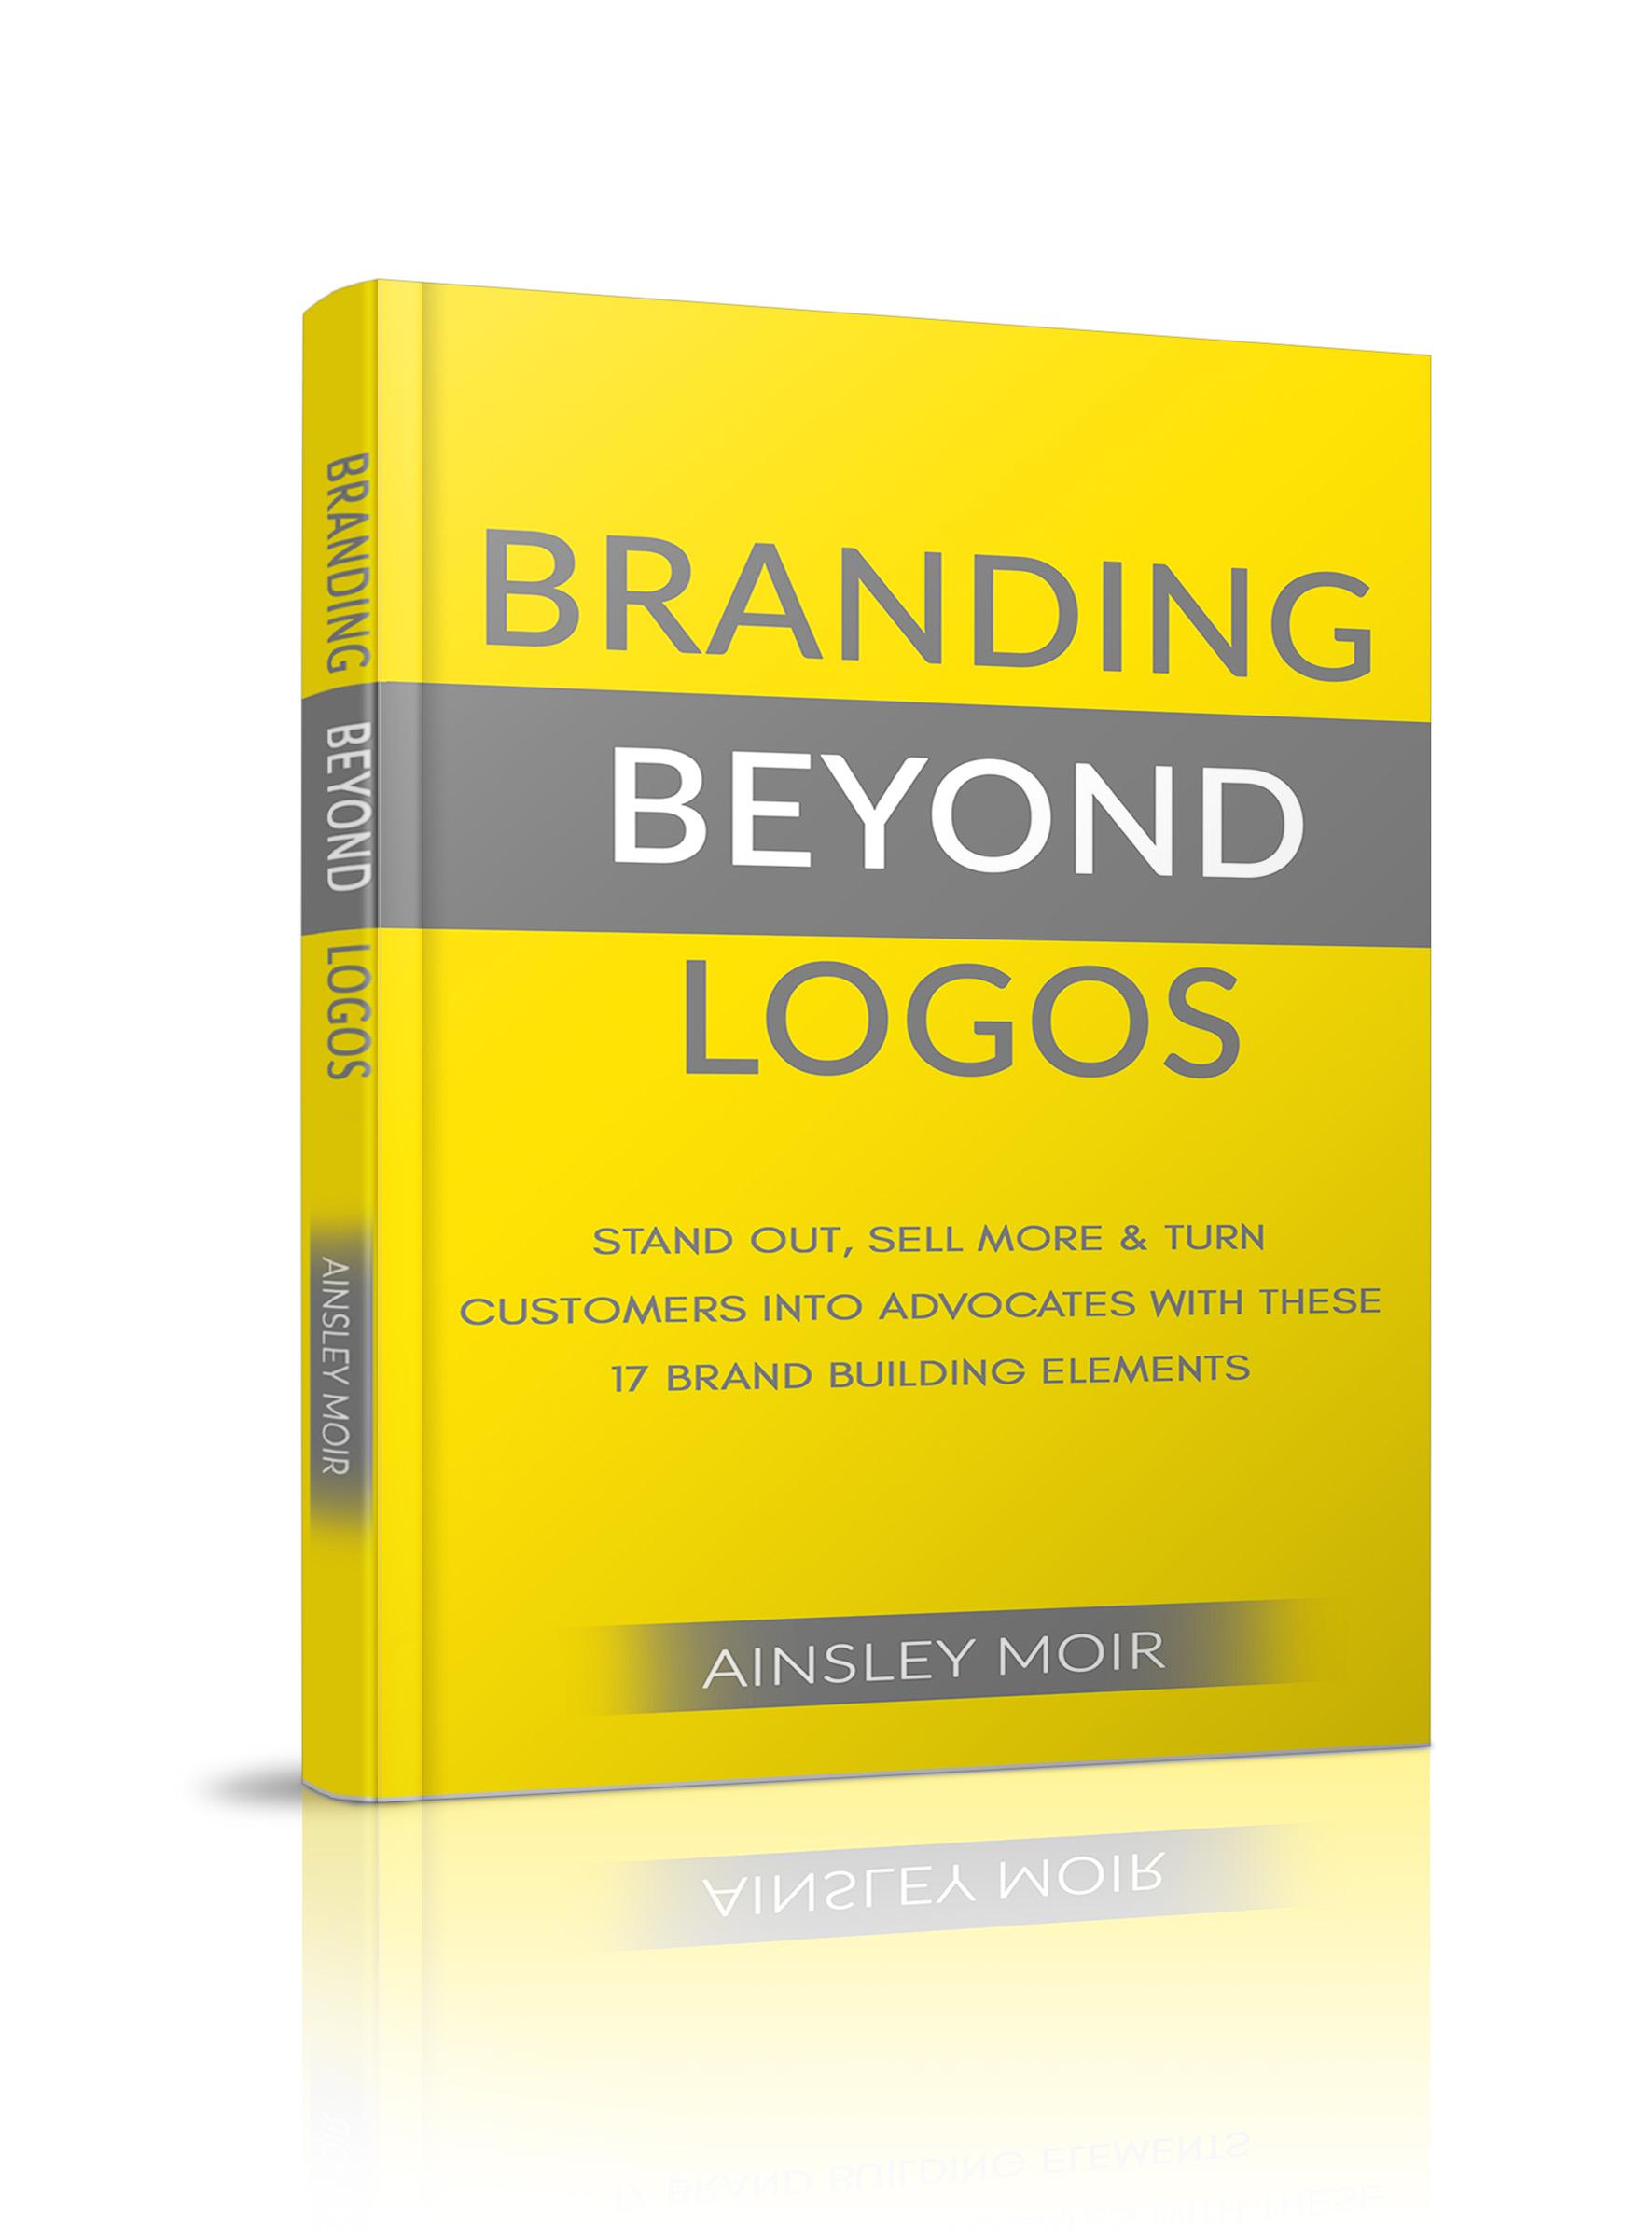 Author Ainsley Moir breaks down branding with Branding Beyond Logos